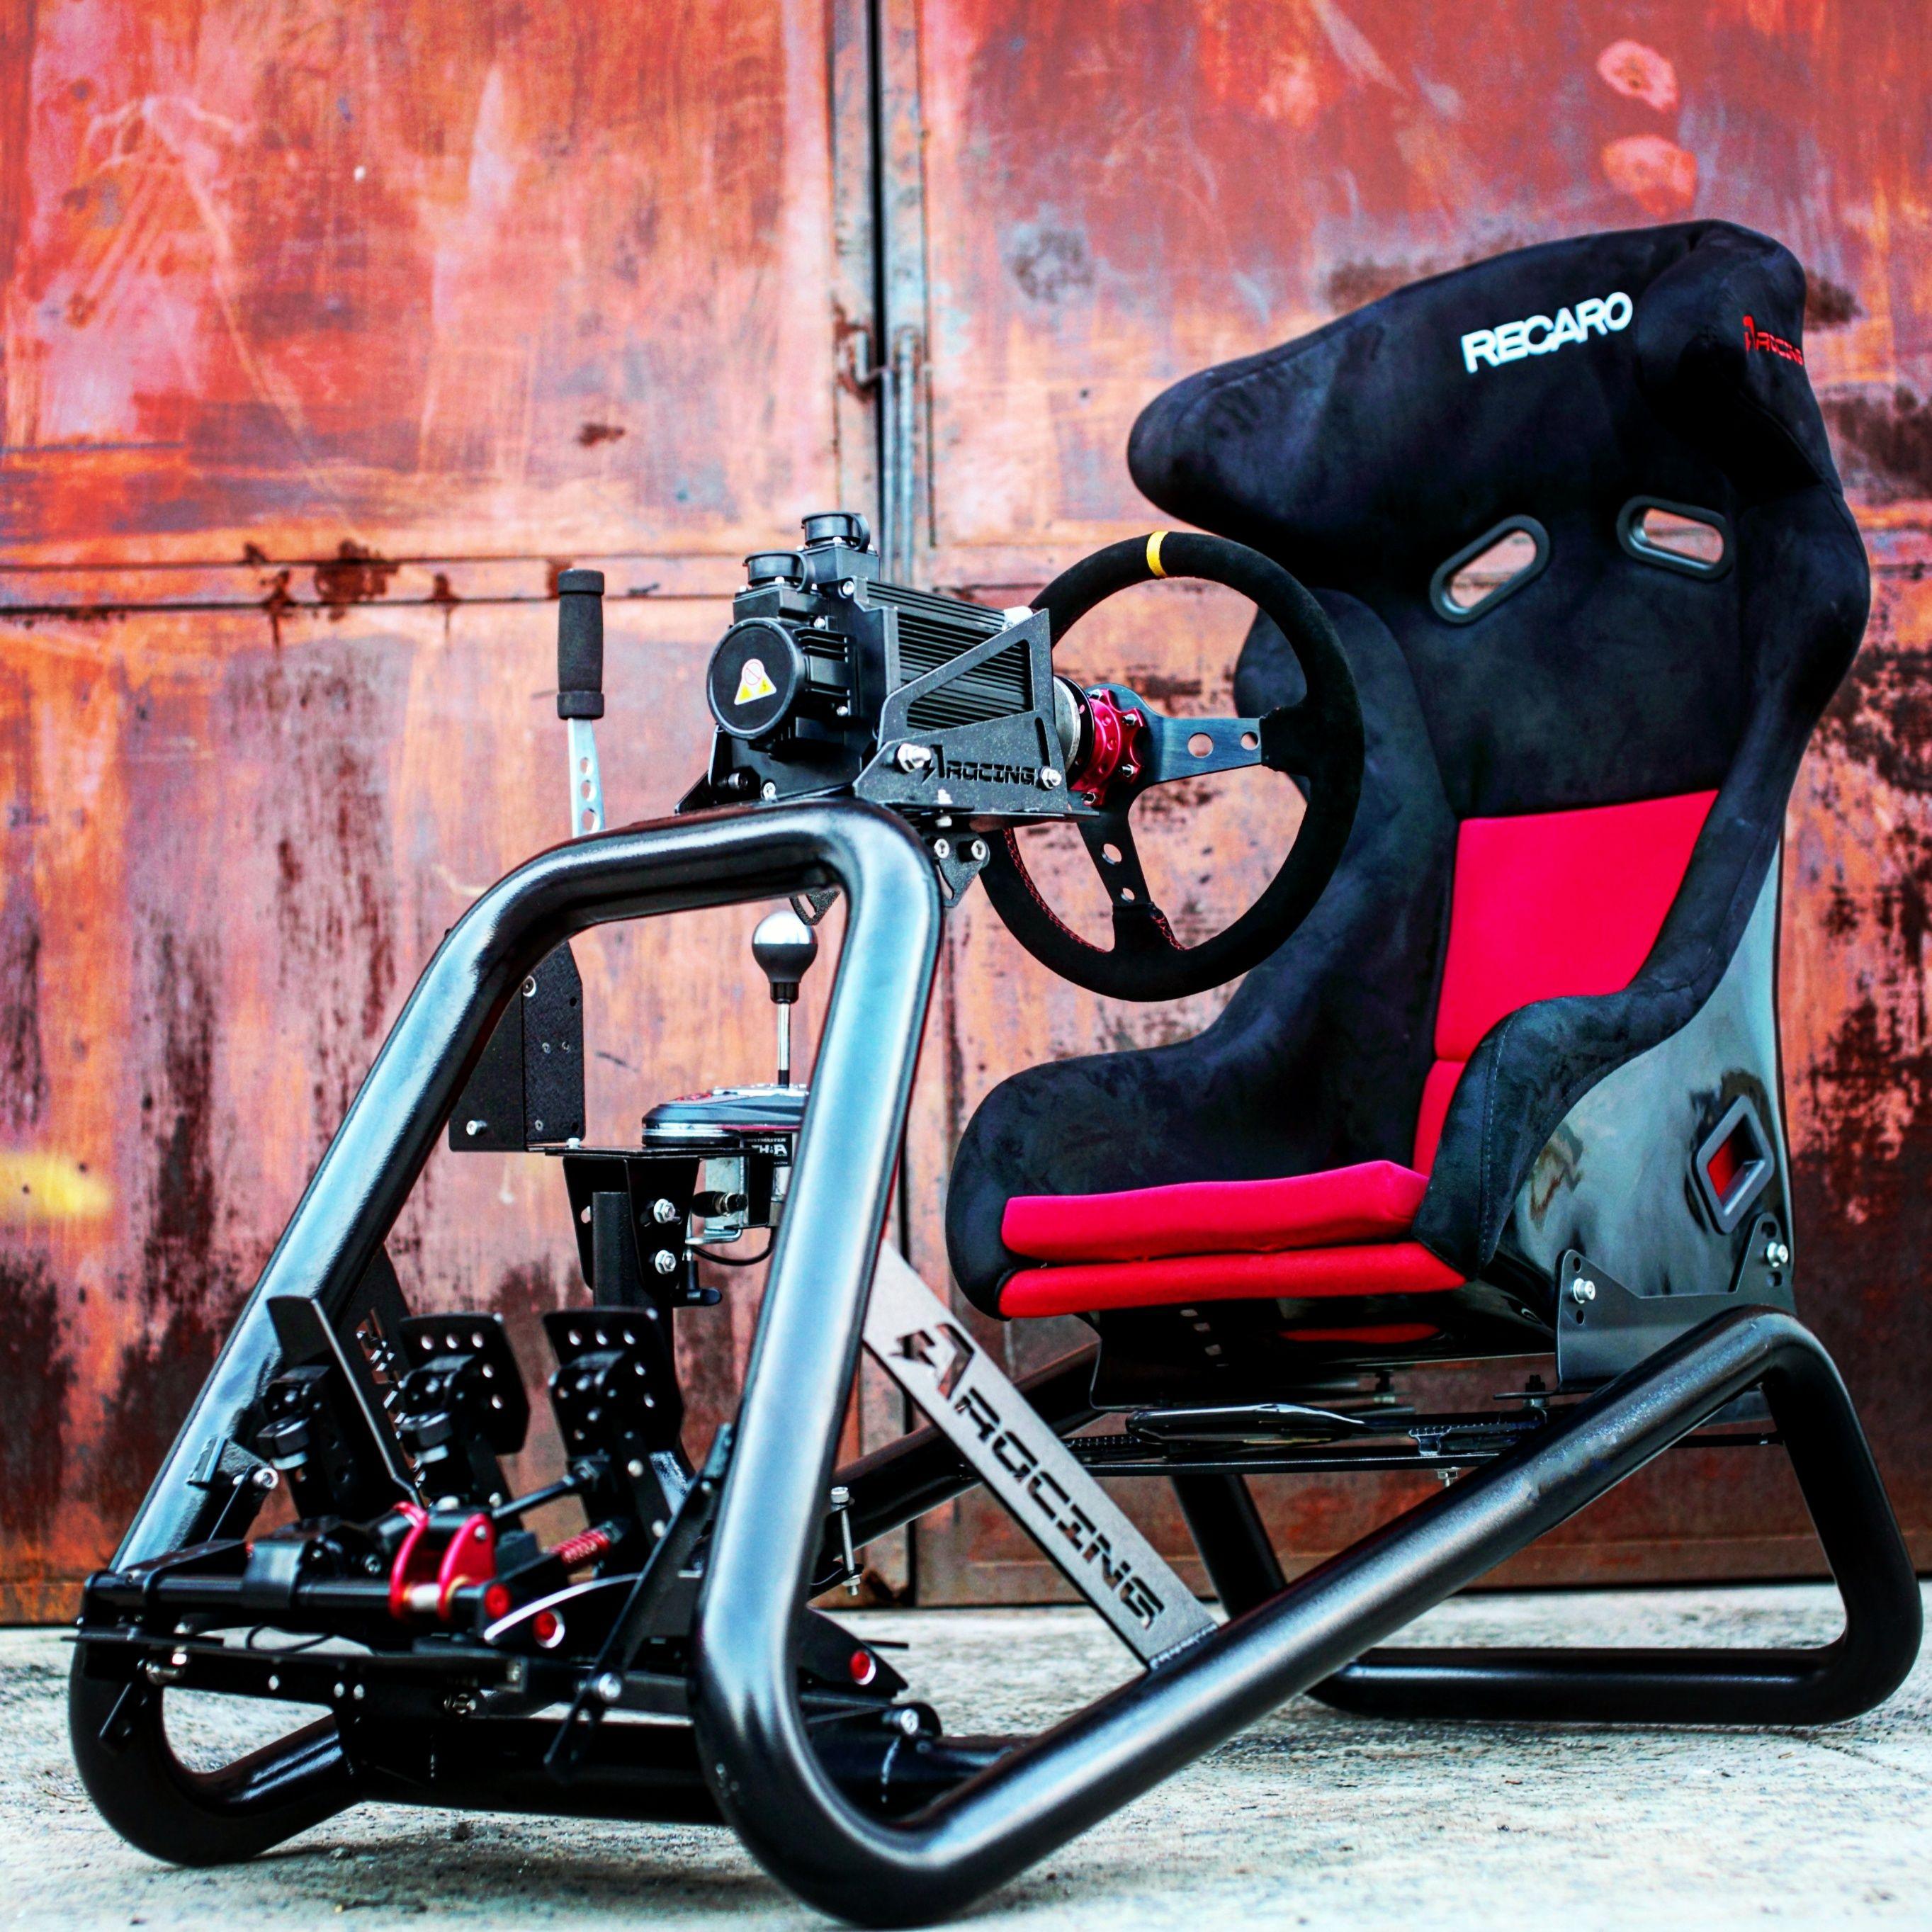 Azracing analog racing steering wheel bracket seat Fanatec